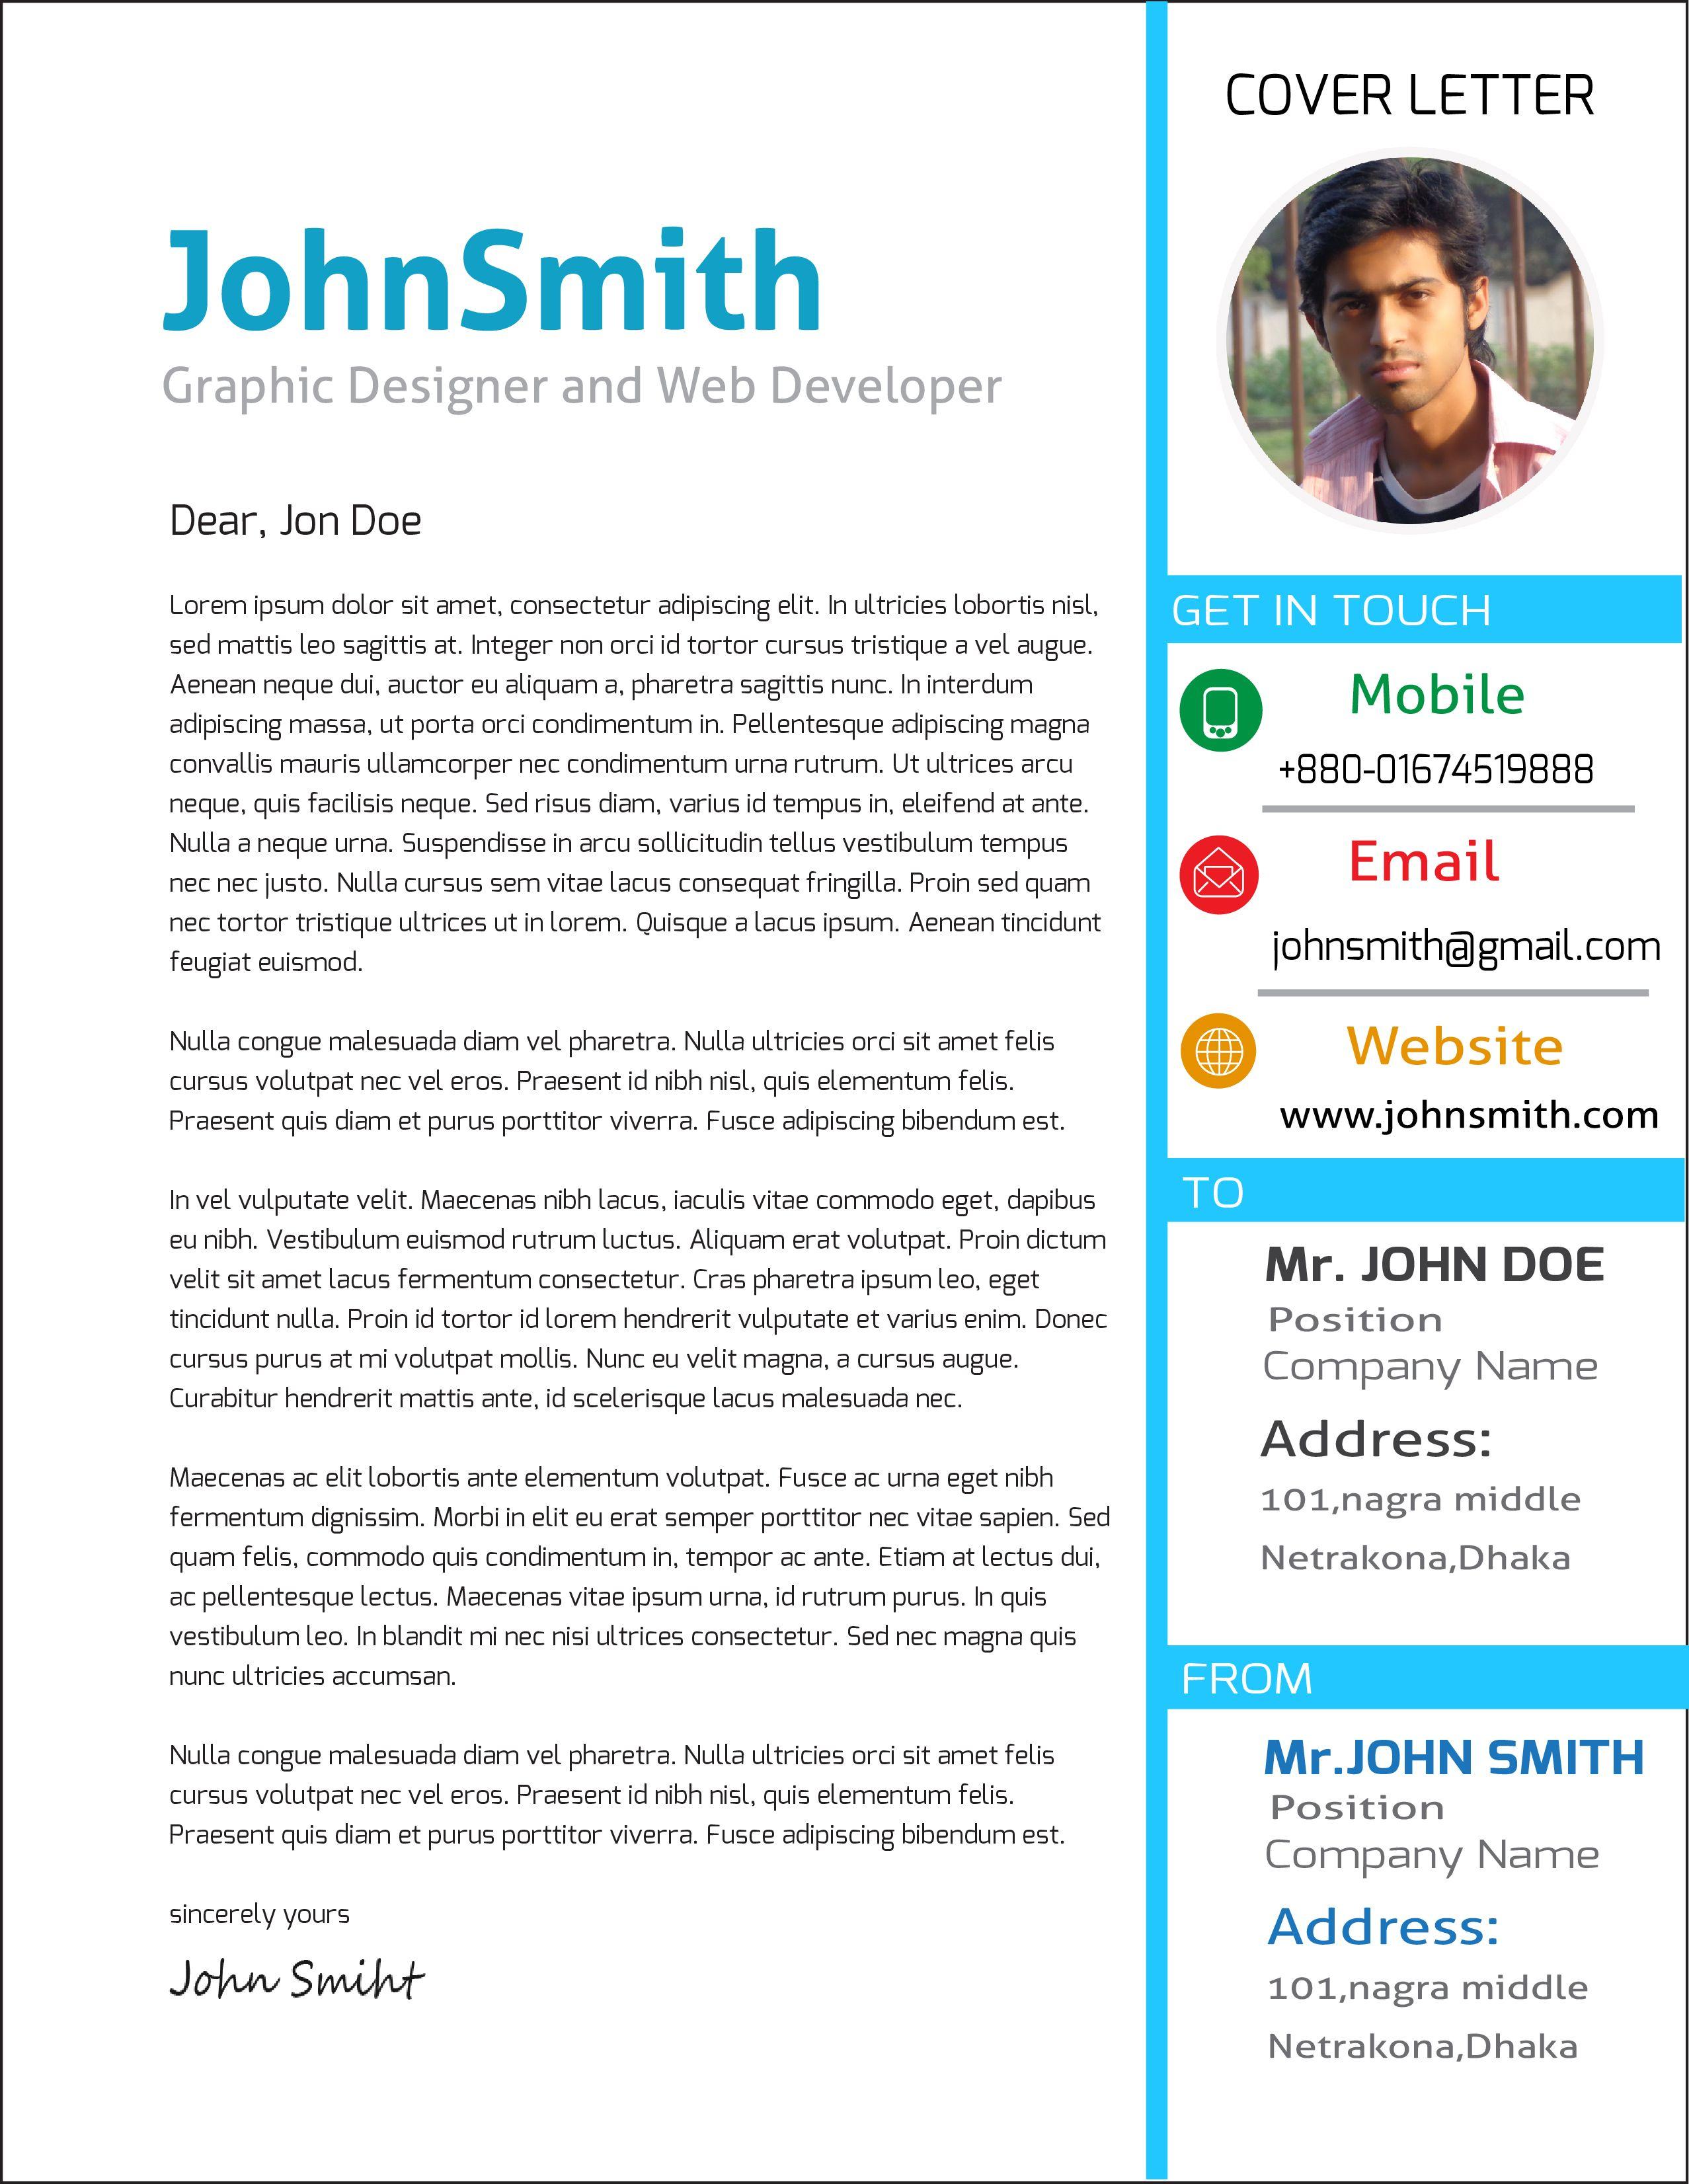 Another resume lettering resume lorem ipsum